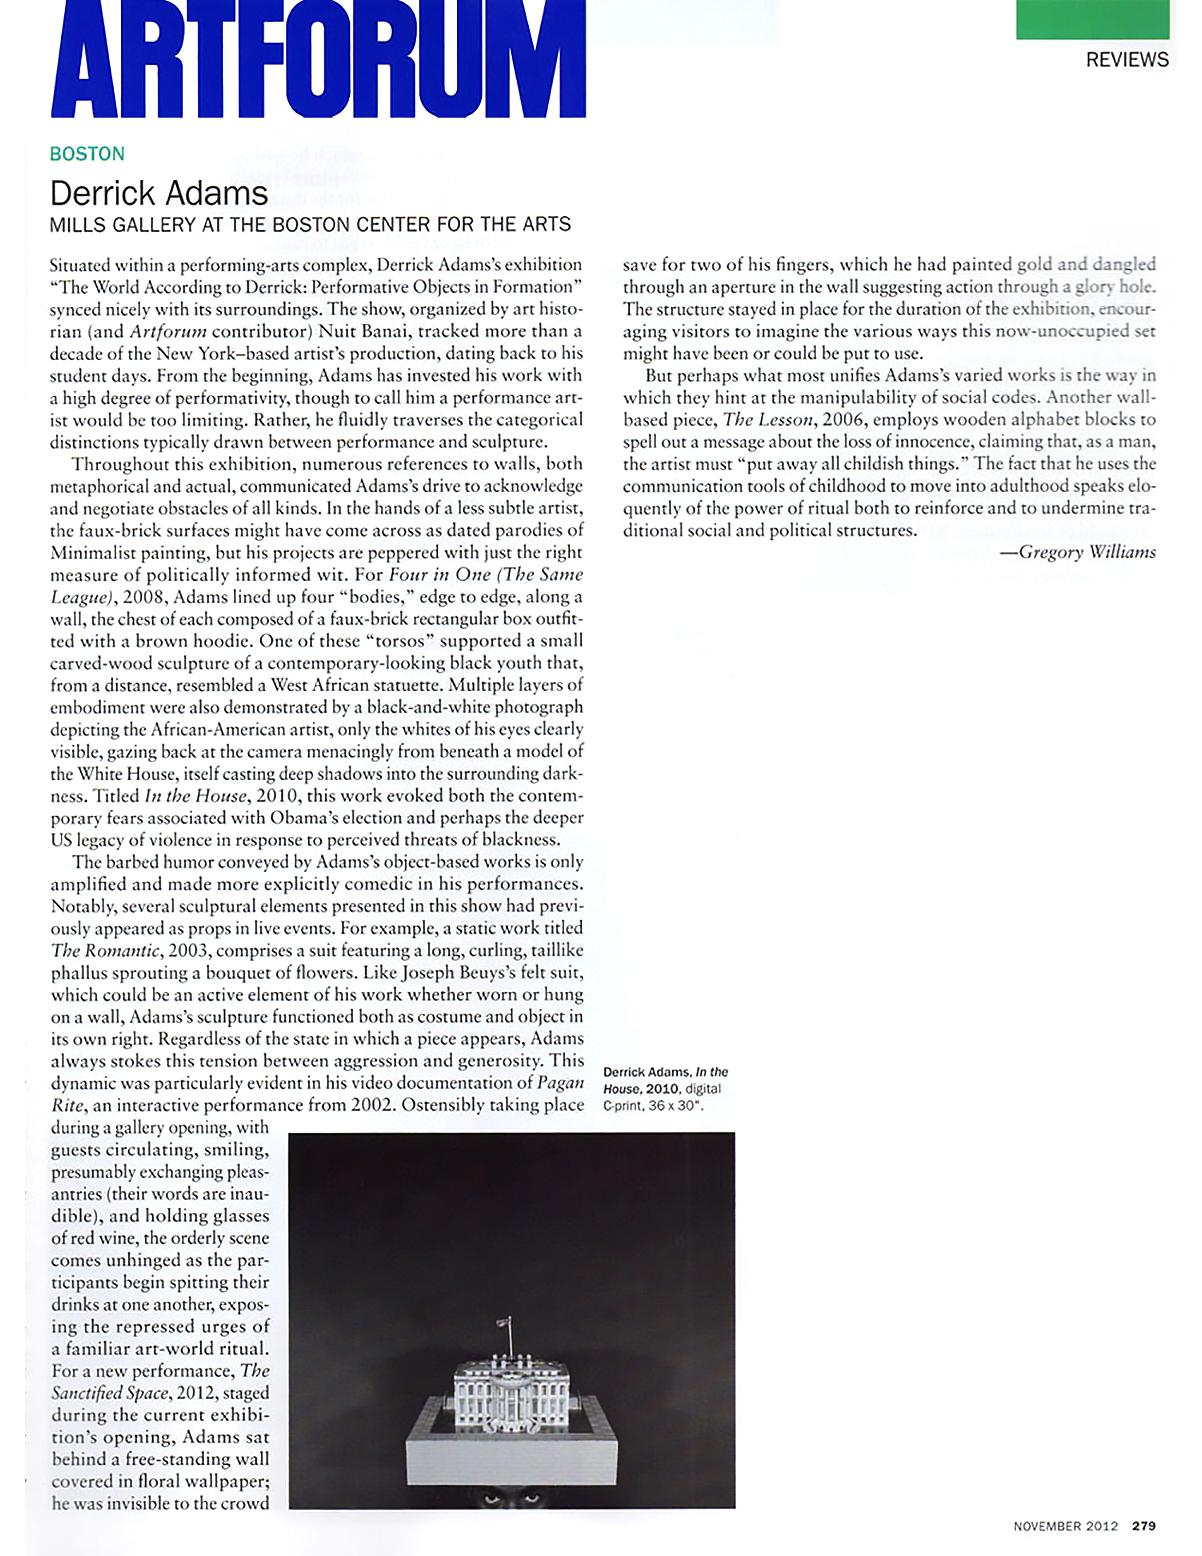 ArtForum 2012 article.jpg